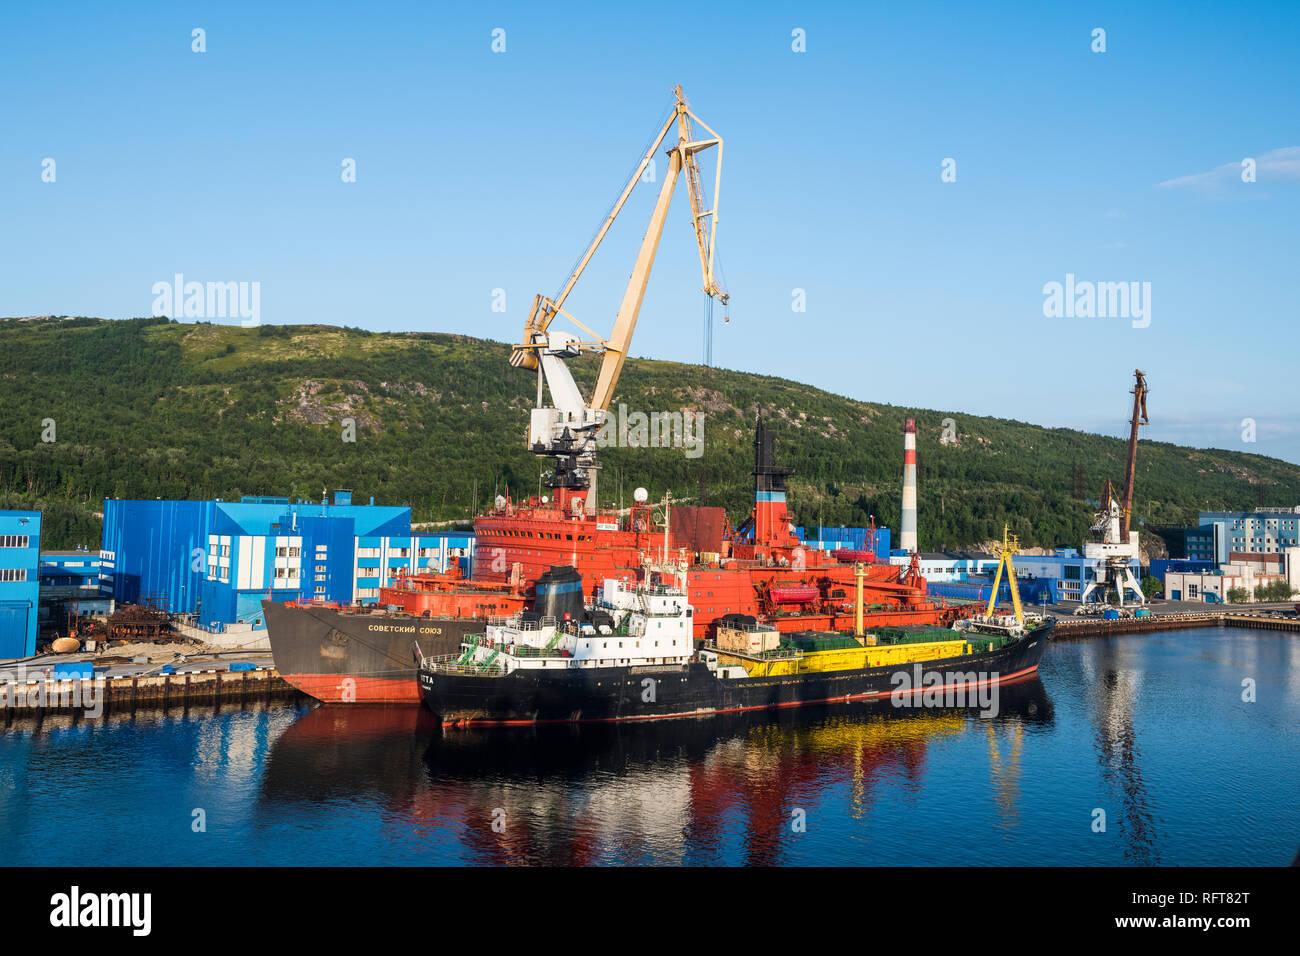 Rusatom port in Murmansk, Russia, Europe - Stock Image